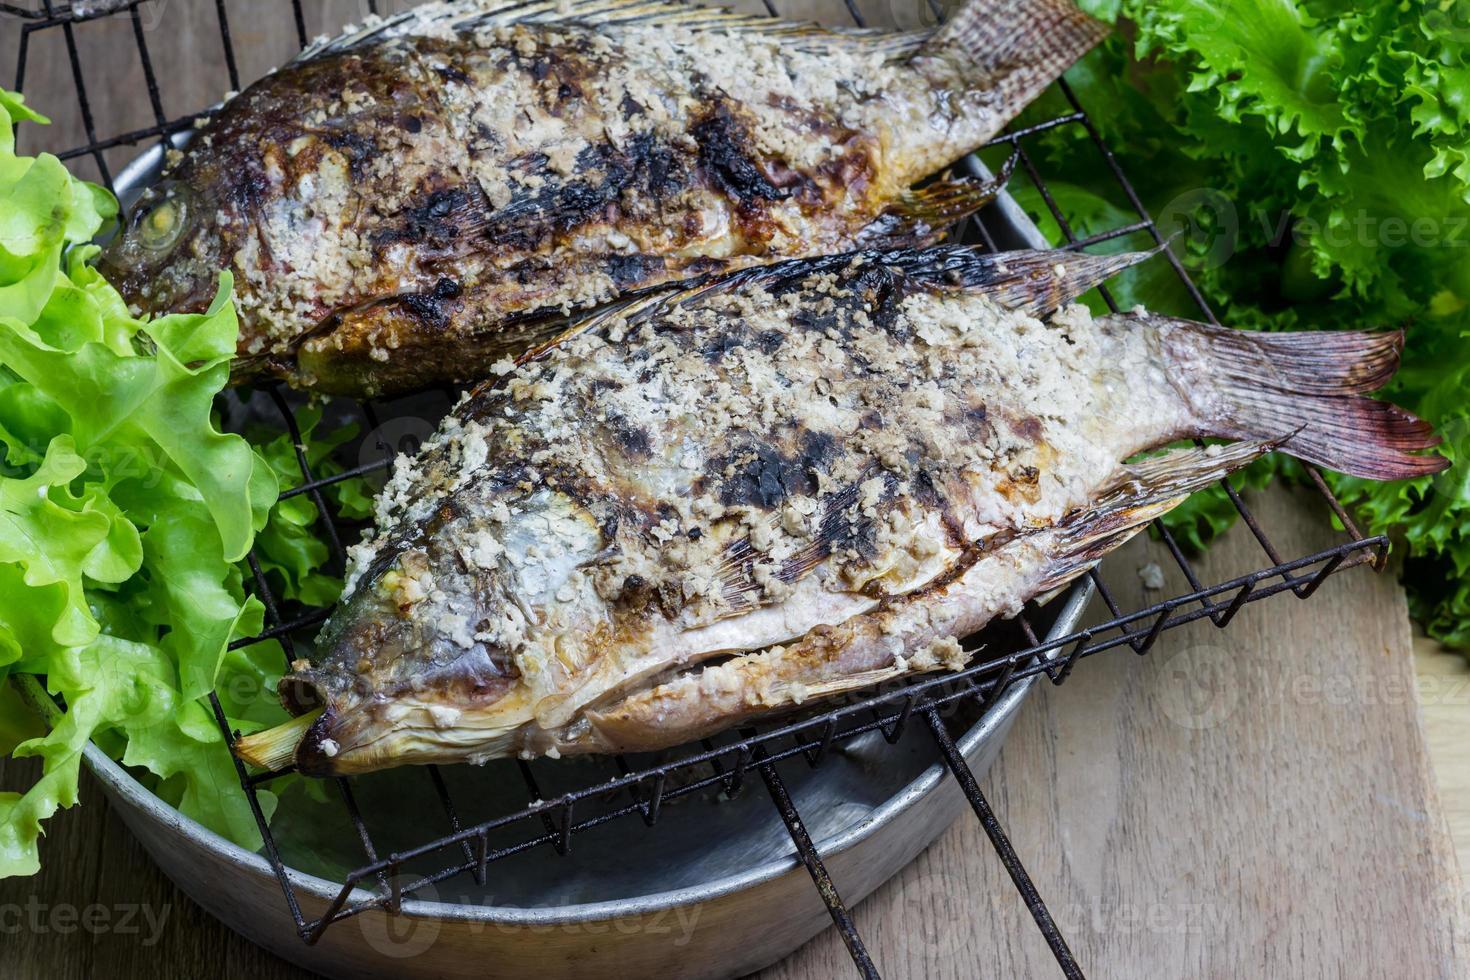 salt crusted grillad nile tilapia fisk foto